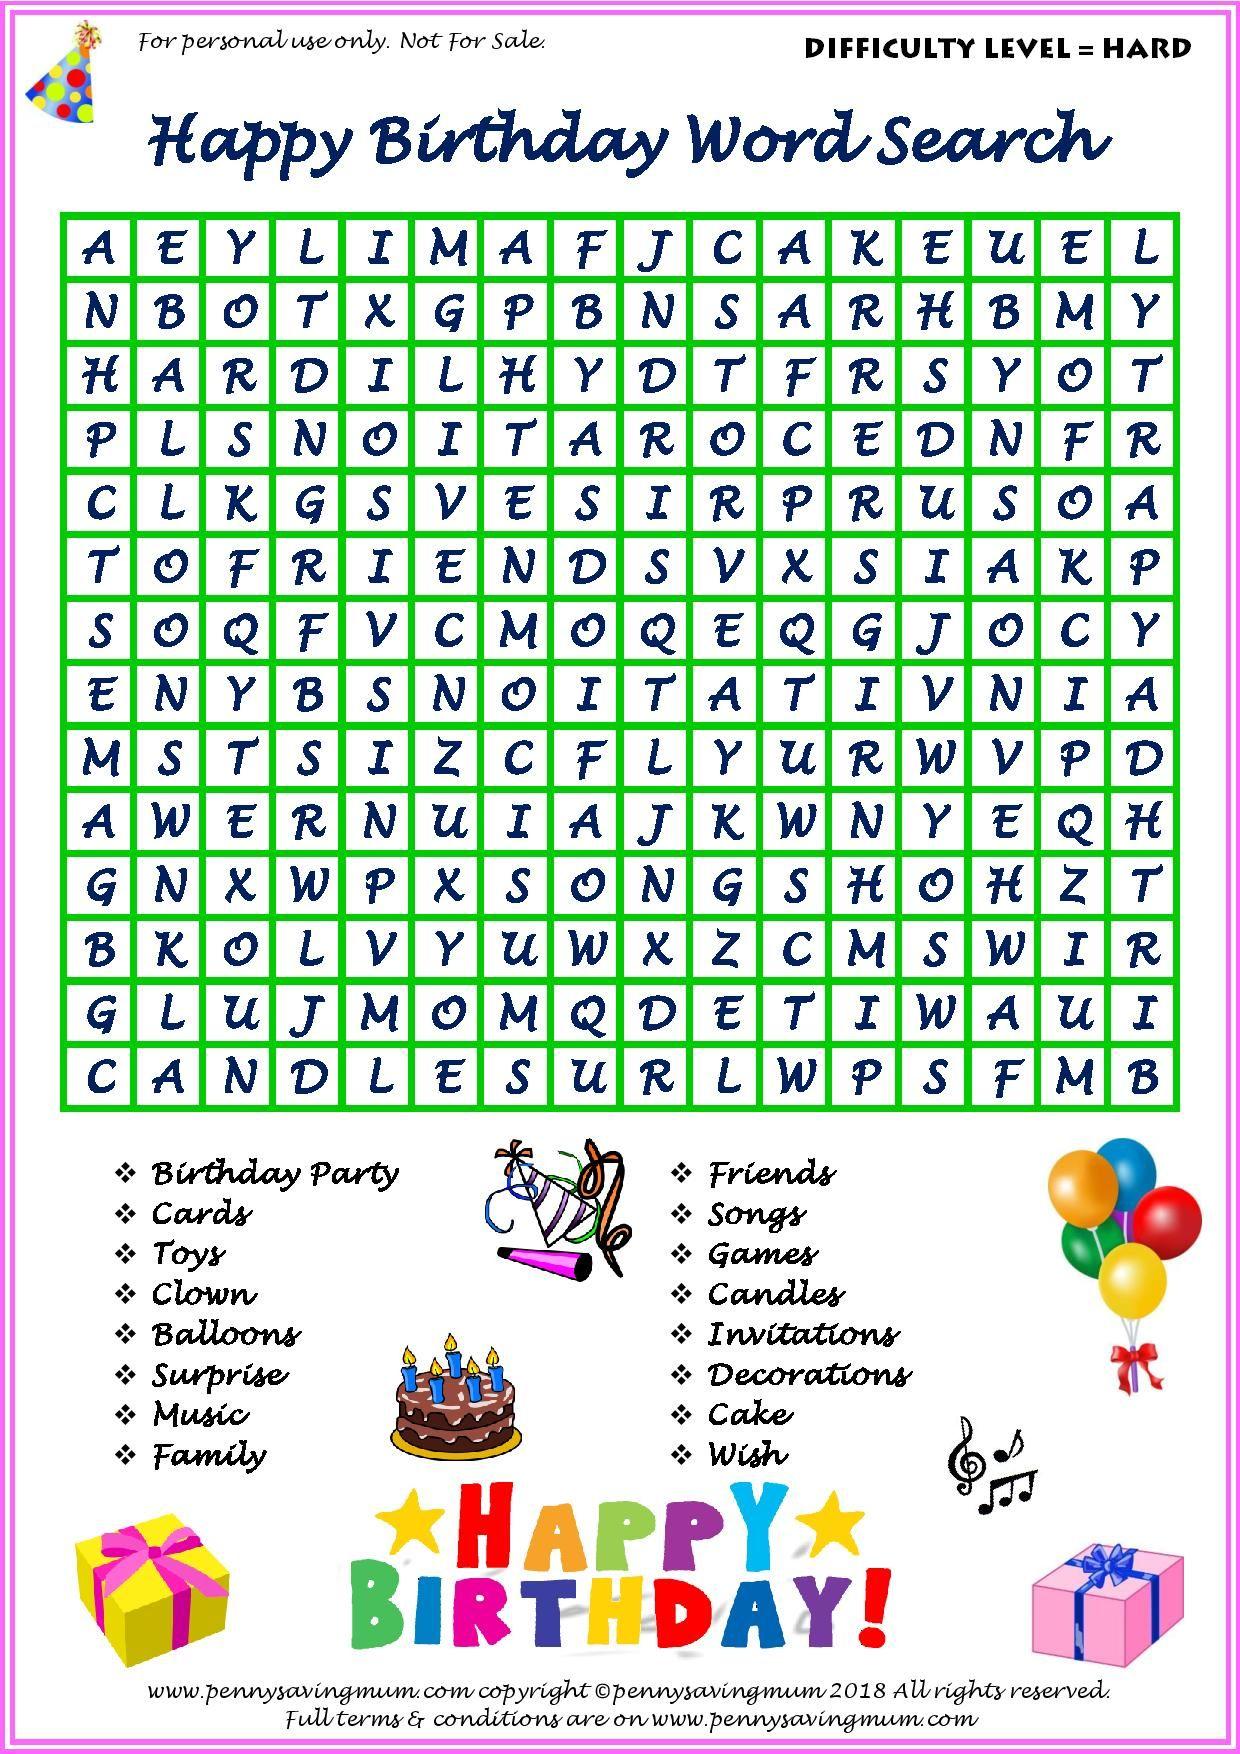 Word Search Happy Birthday Hard Version